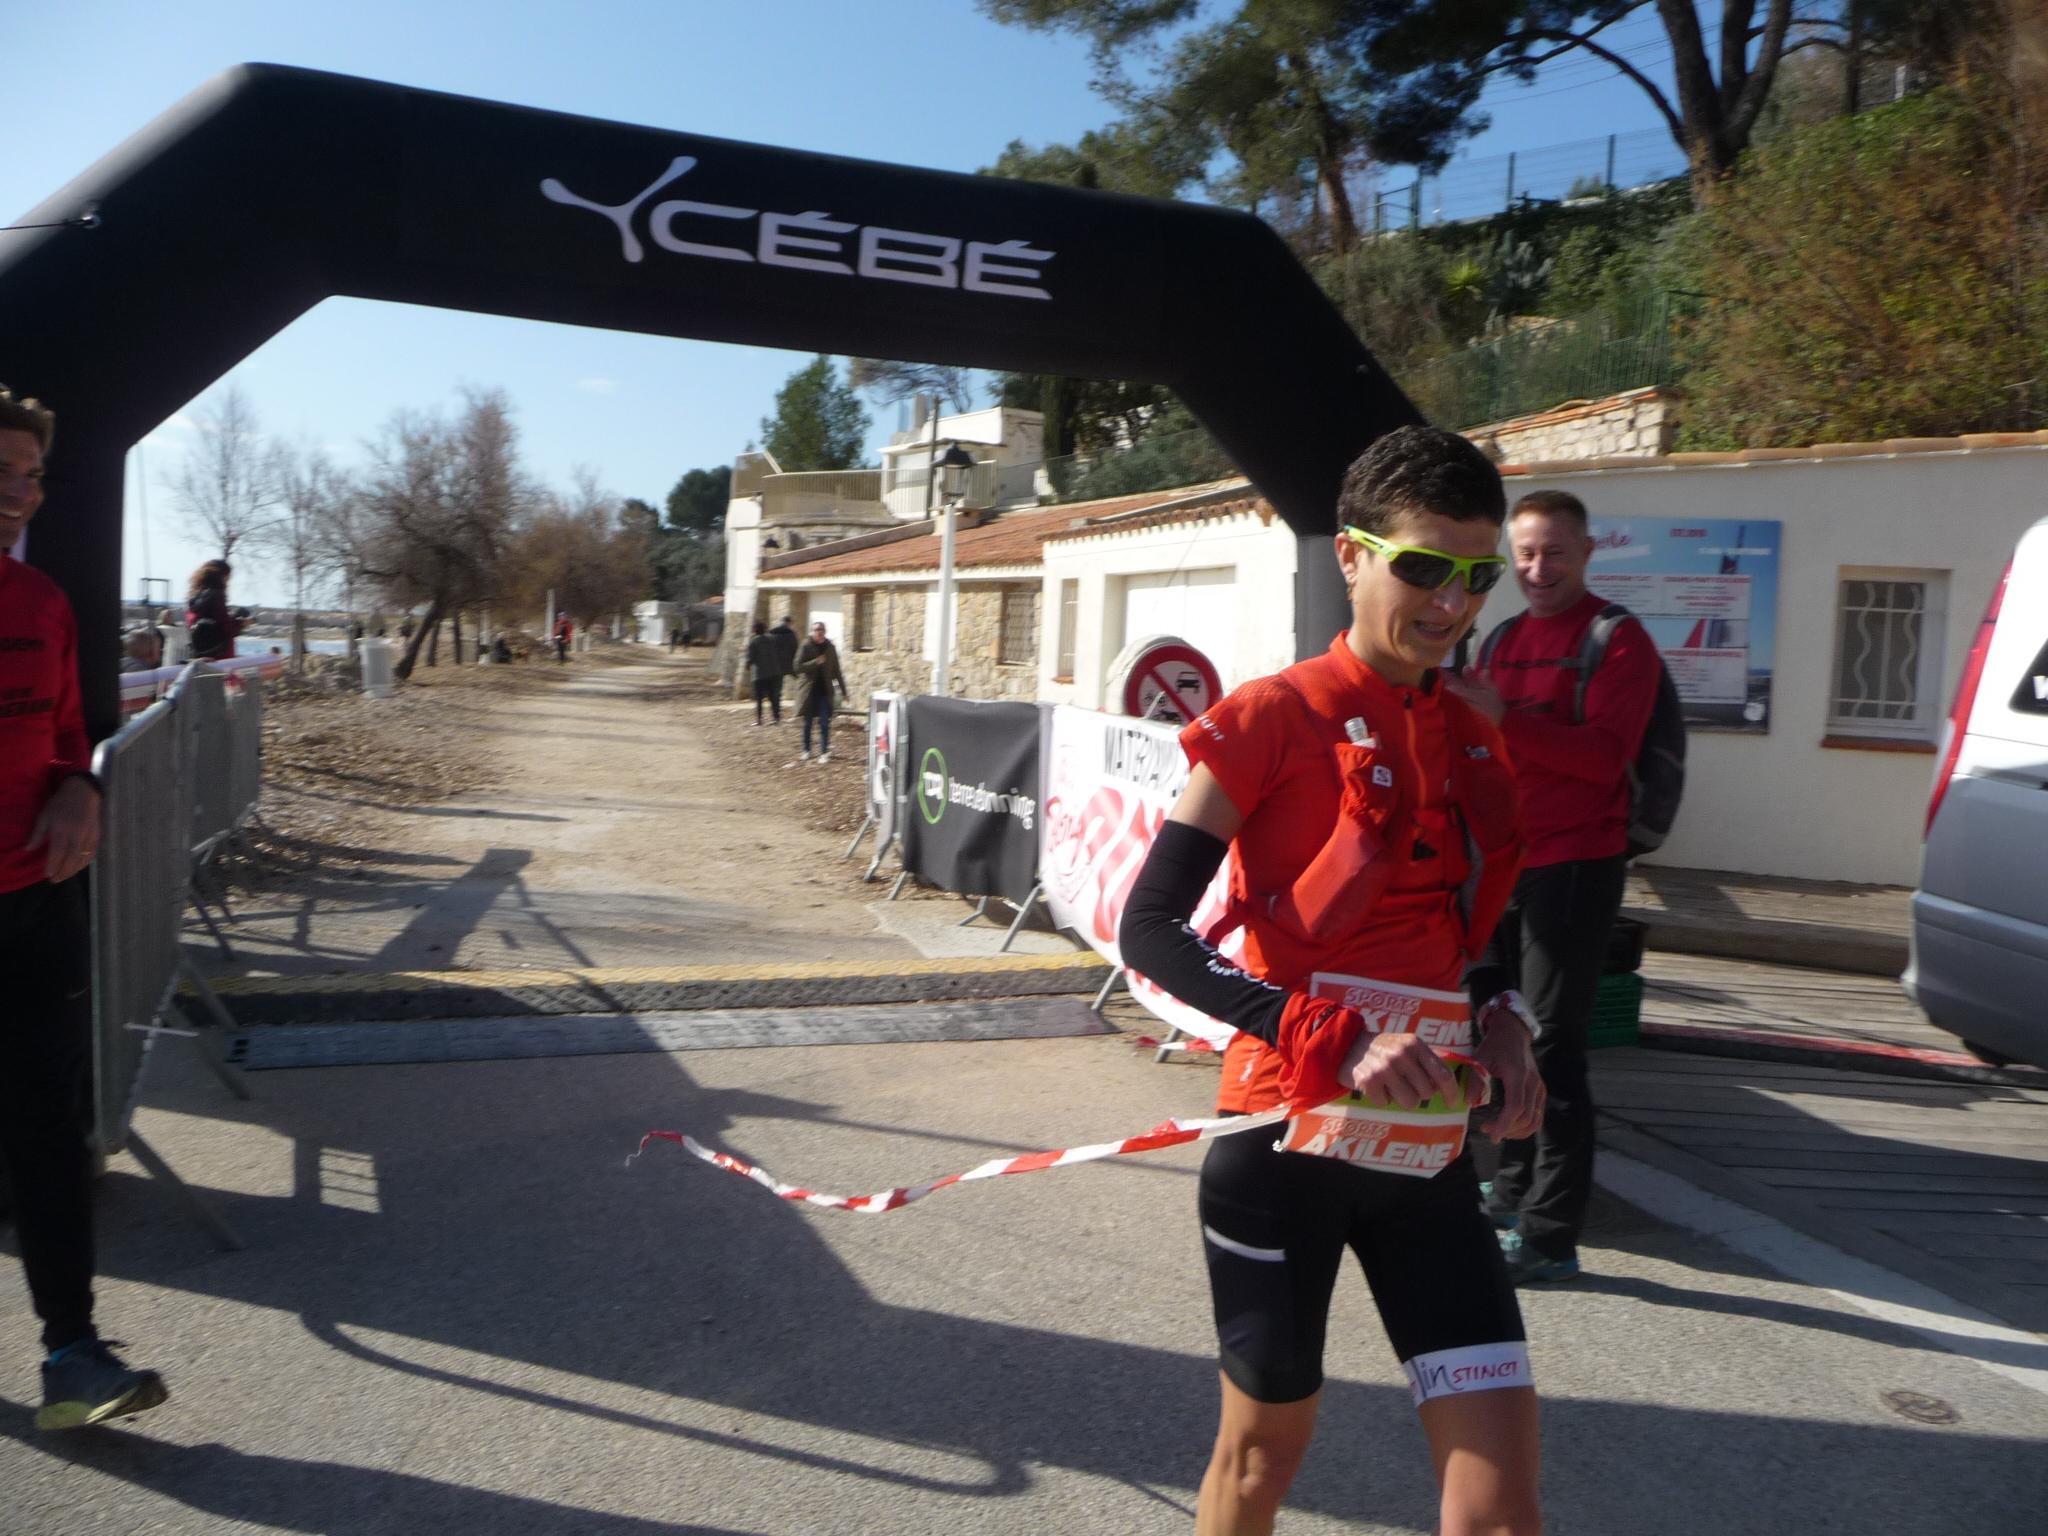 Tri-Academy-Stage-Triathlon-Var-83-Carqueiranne